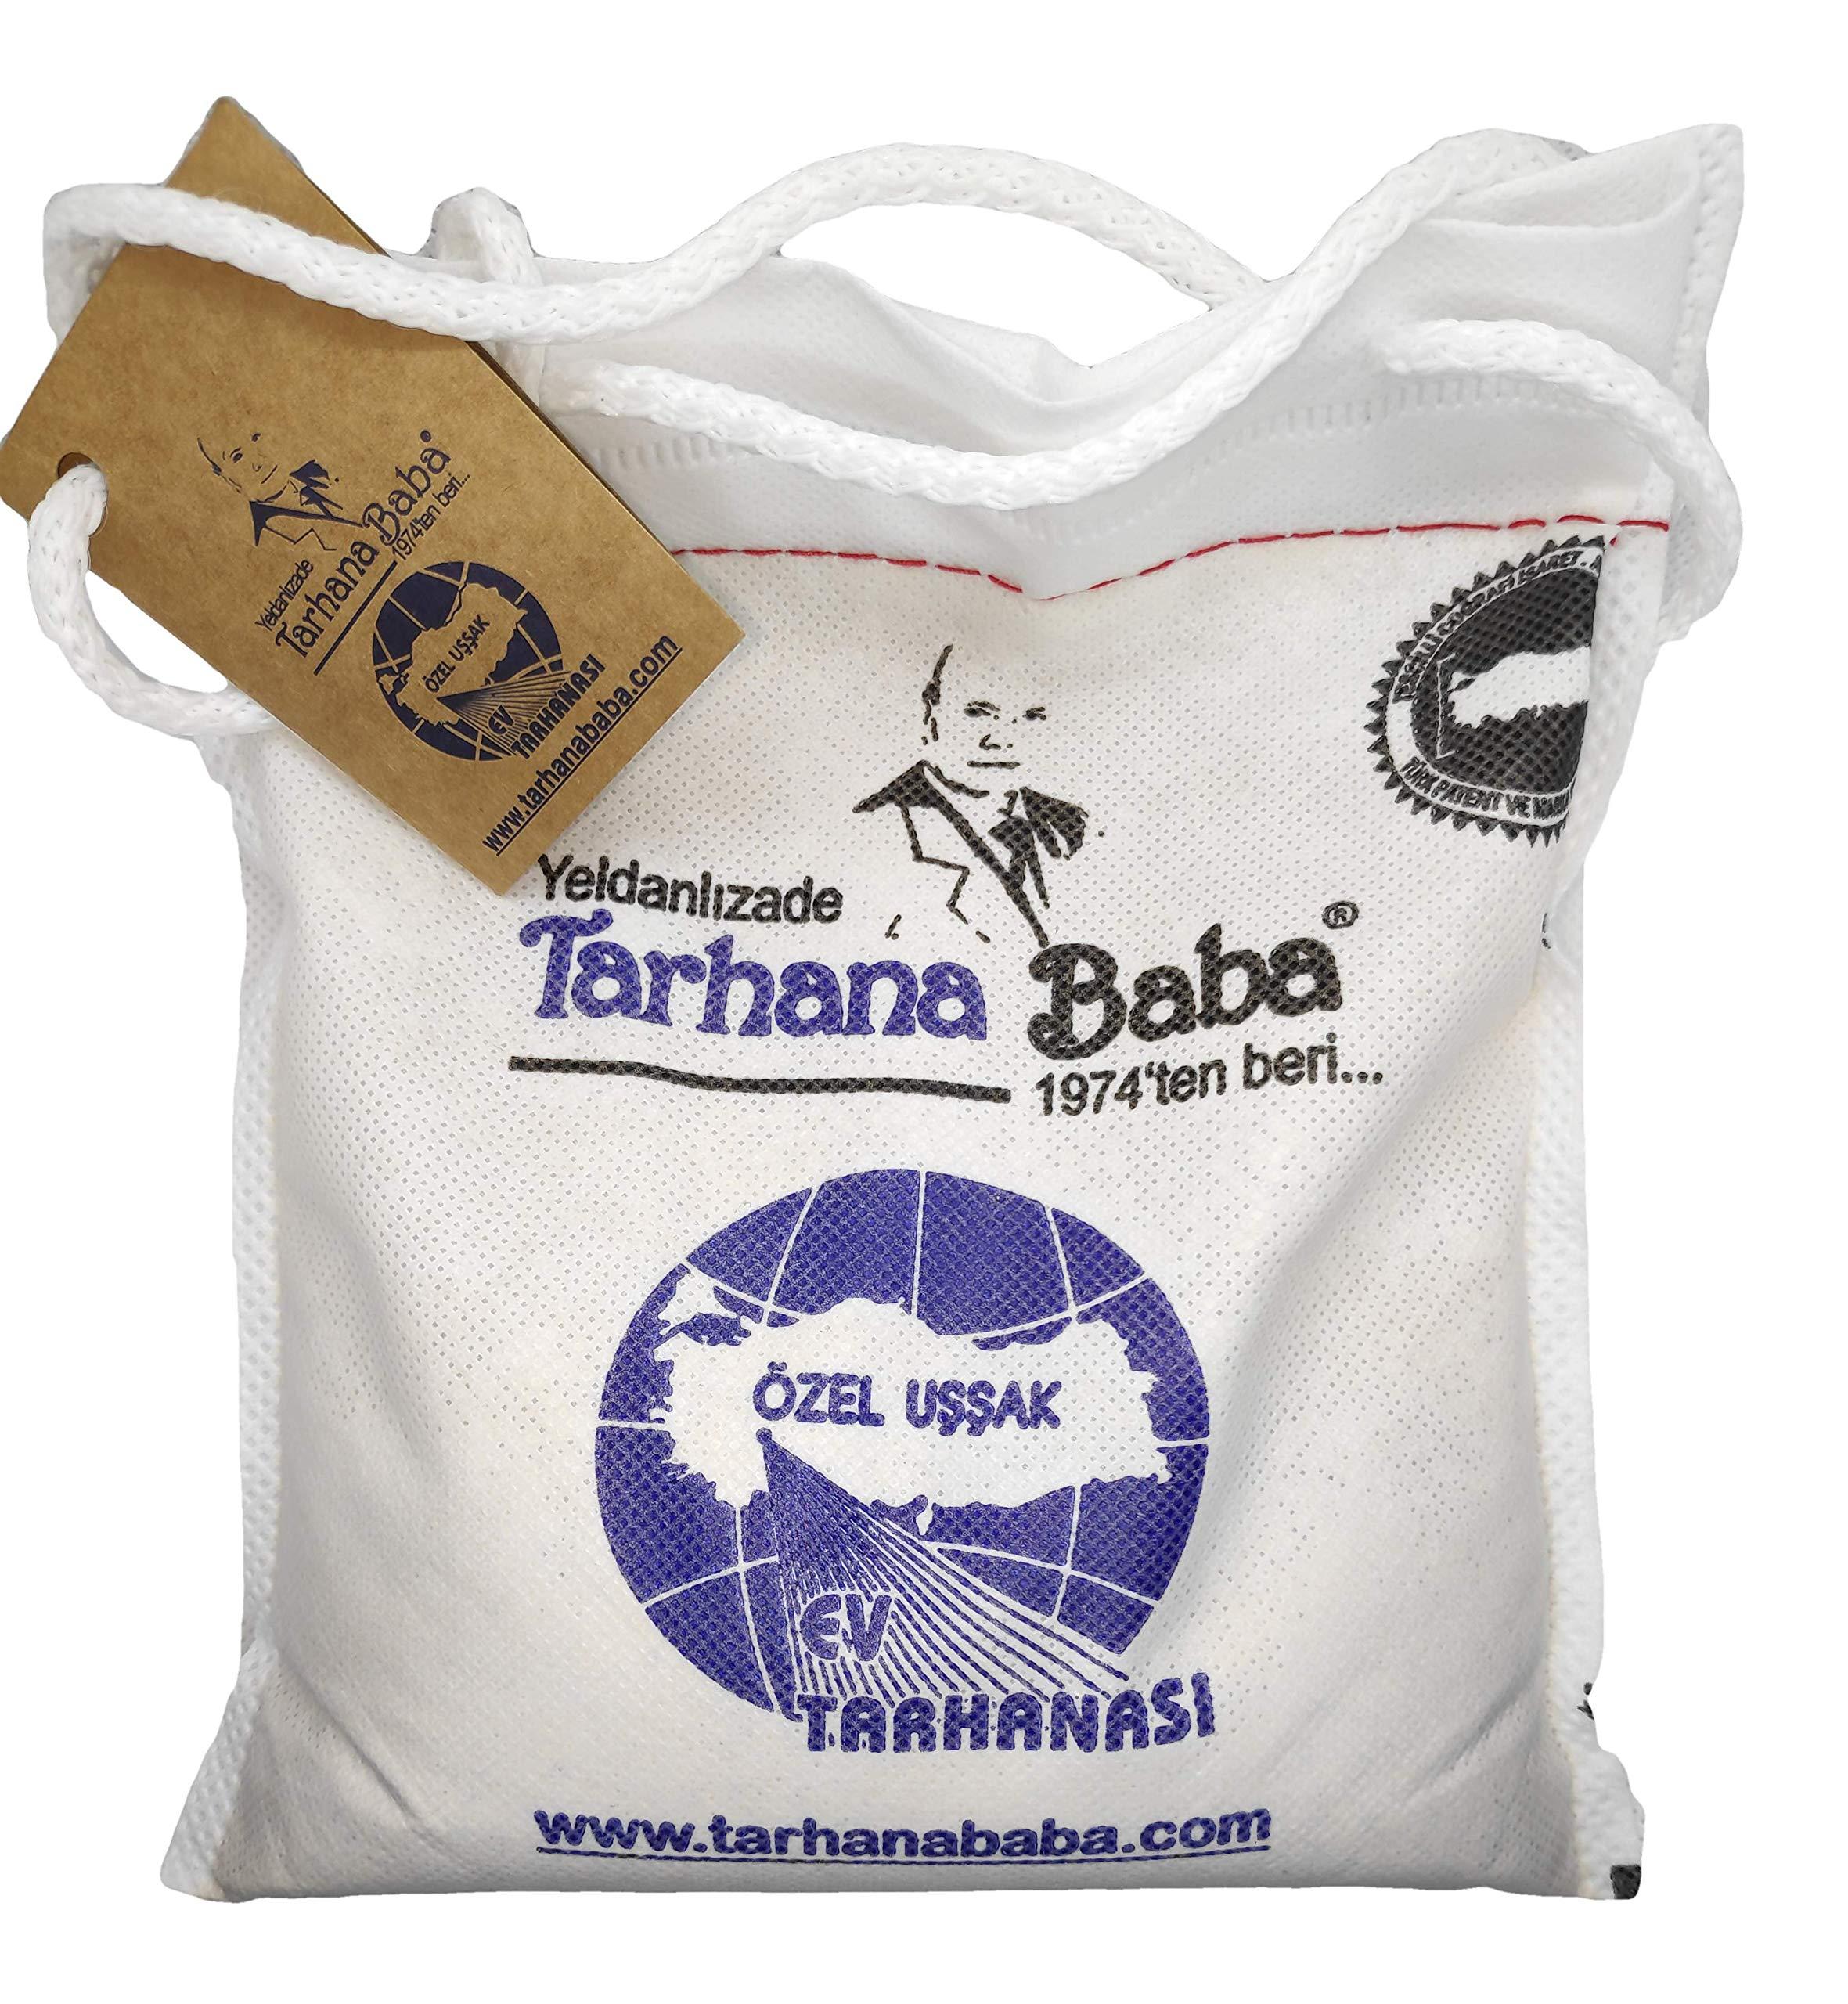 Tarhana Baba Turkish Food Grocery Homestyle Sour Trahana Dry Vegetarian Soup Mix (Tarhana soup, 1.1 LB)